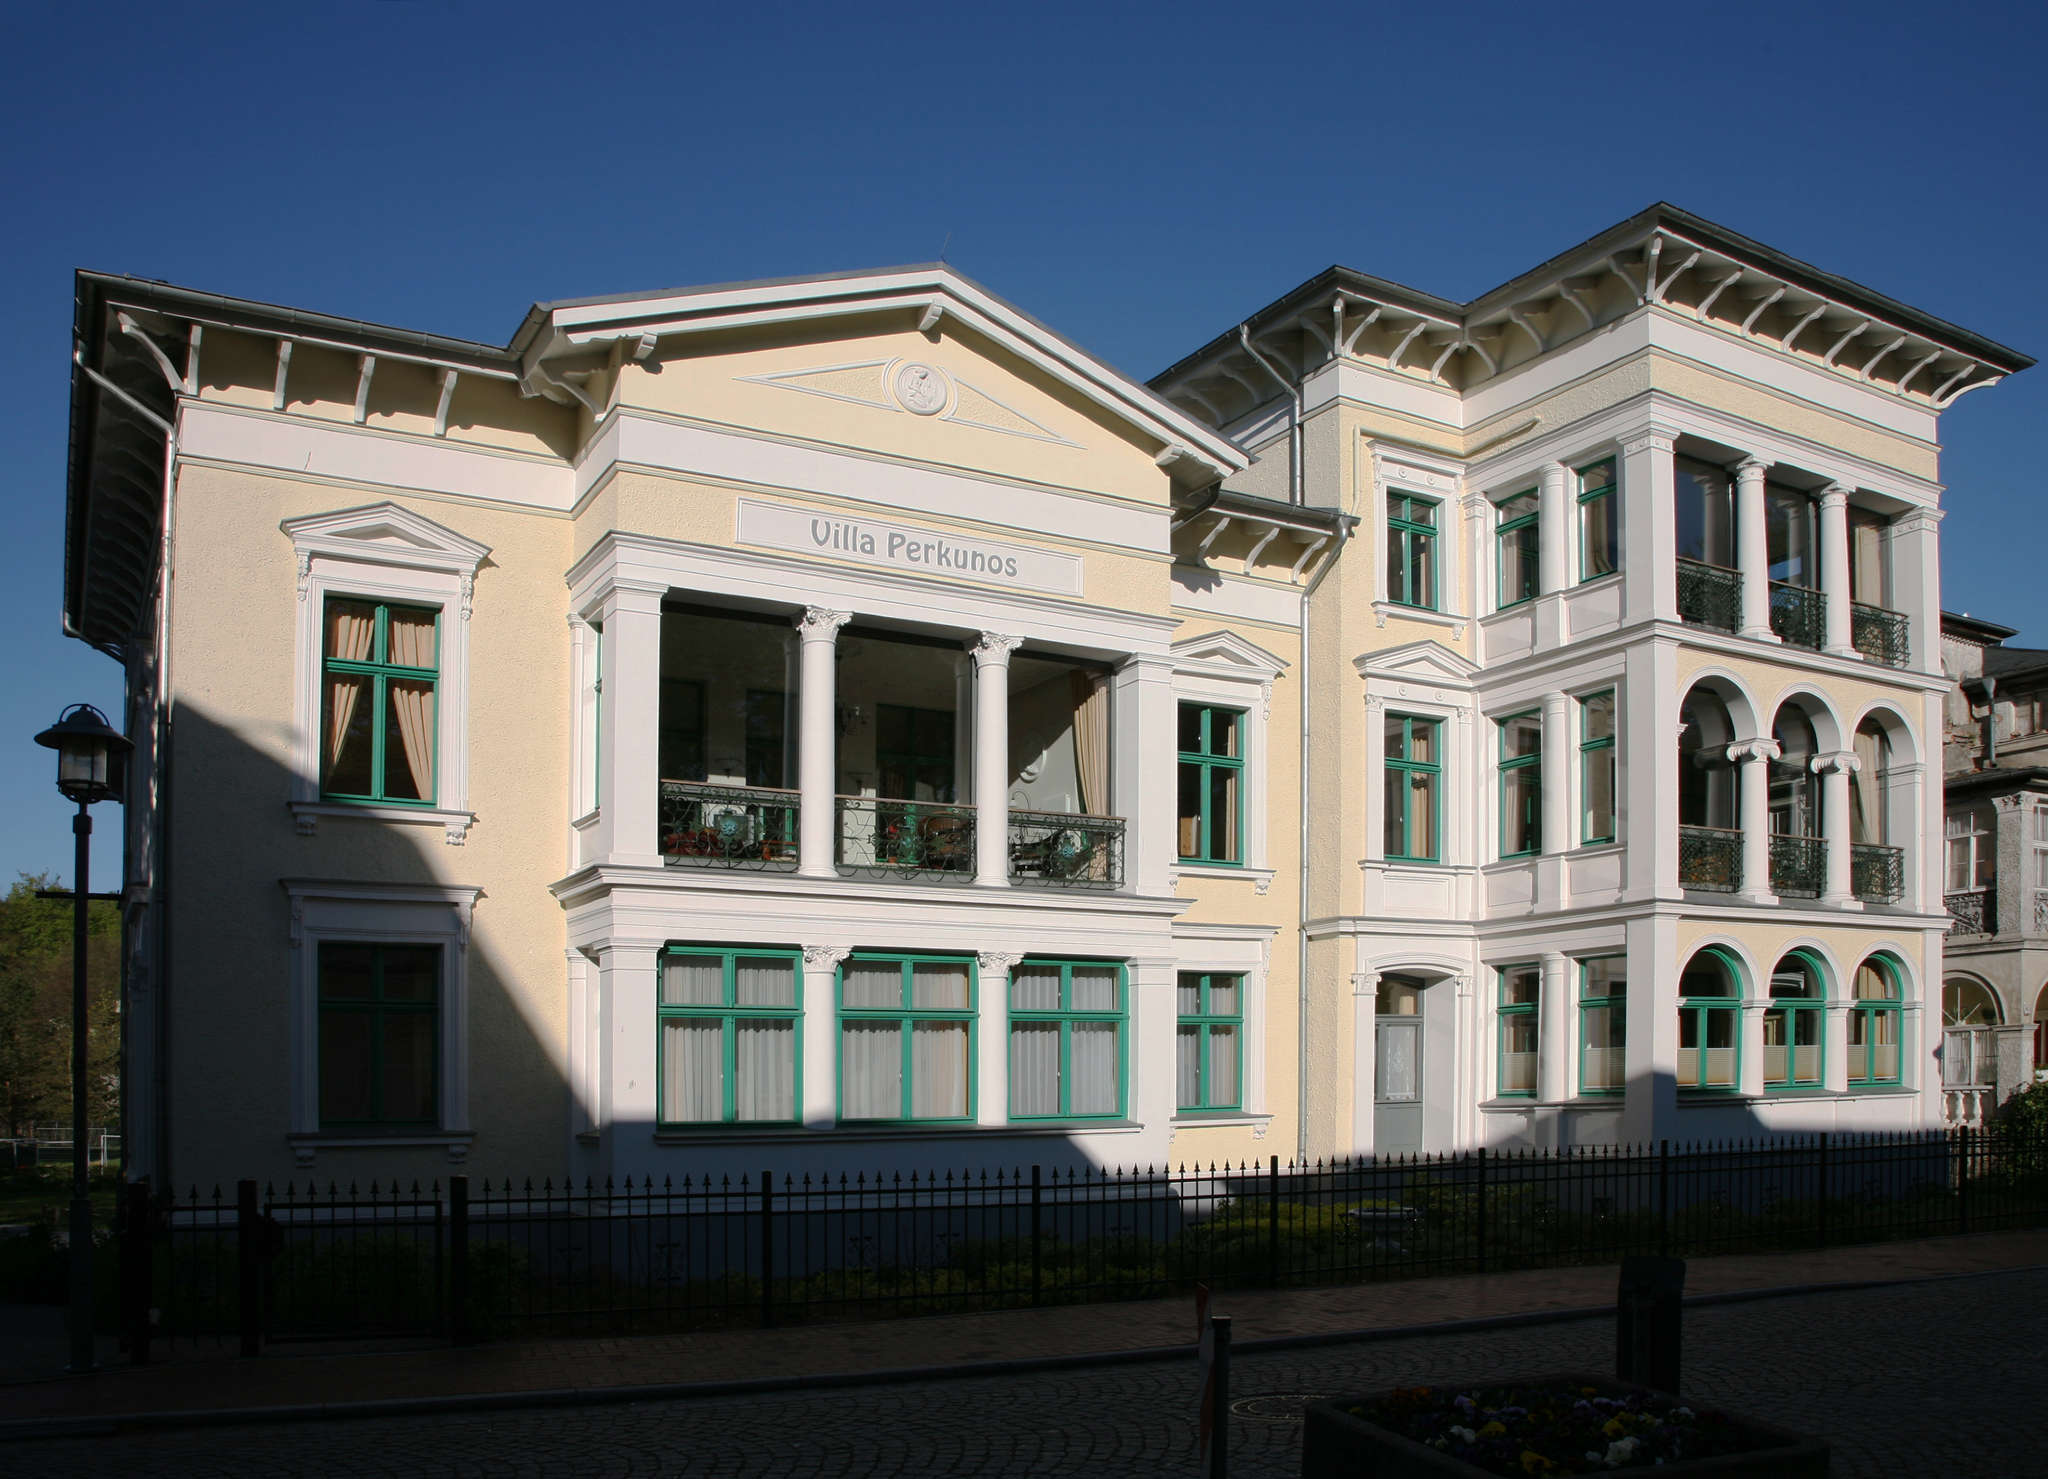 Sitzecke Wohnung Nr. 8 Villa Perkunos